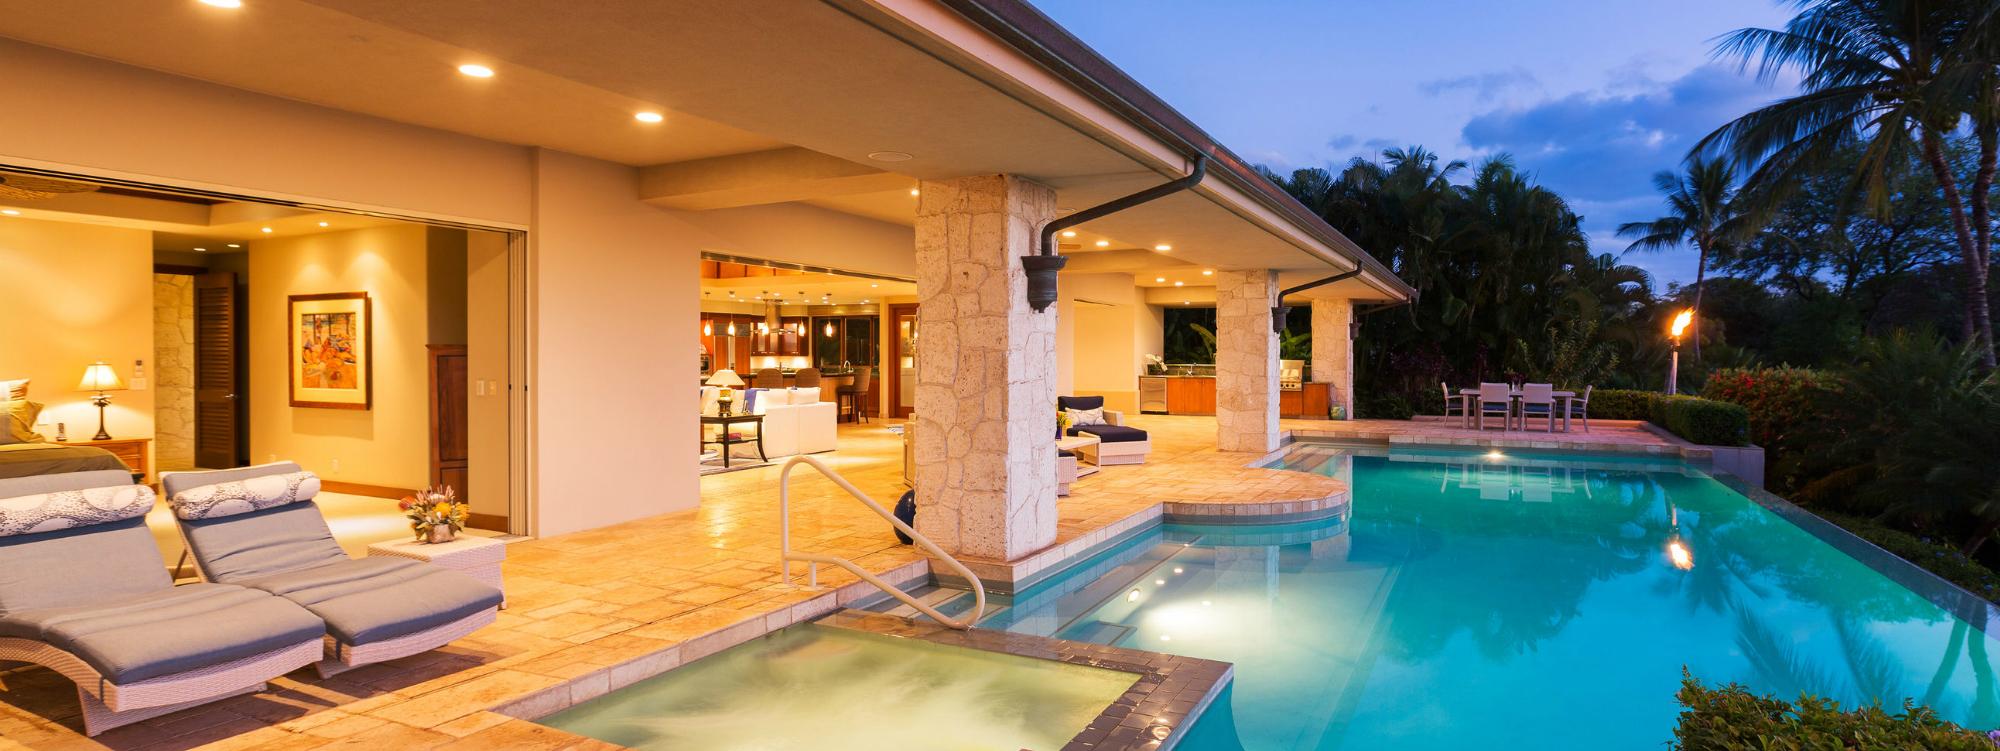 San Antonio Homes For Sale With Pools